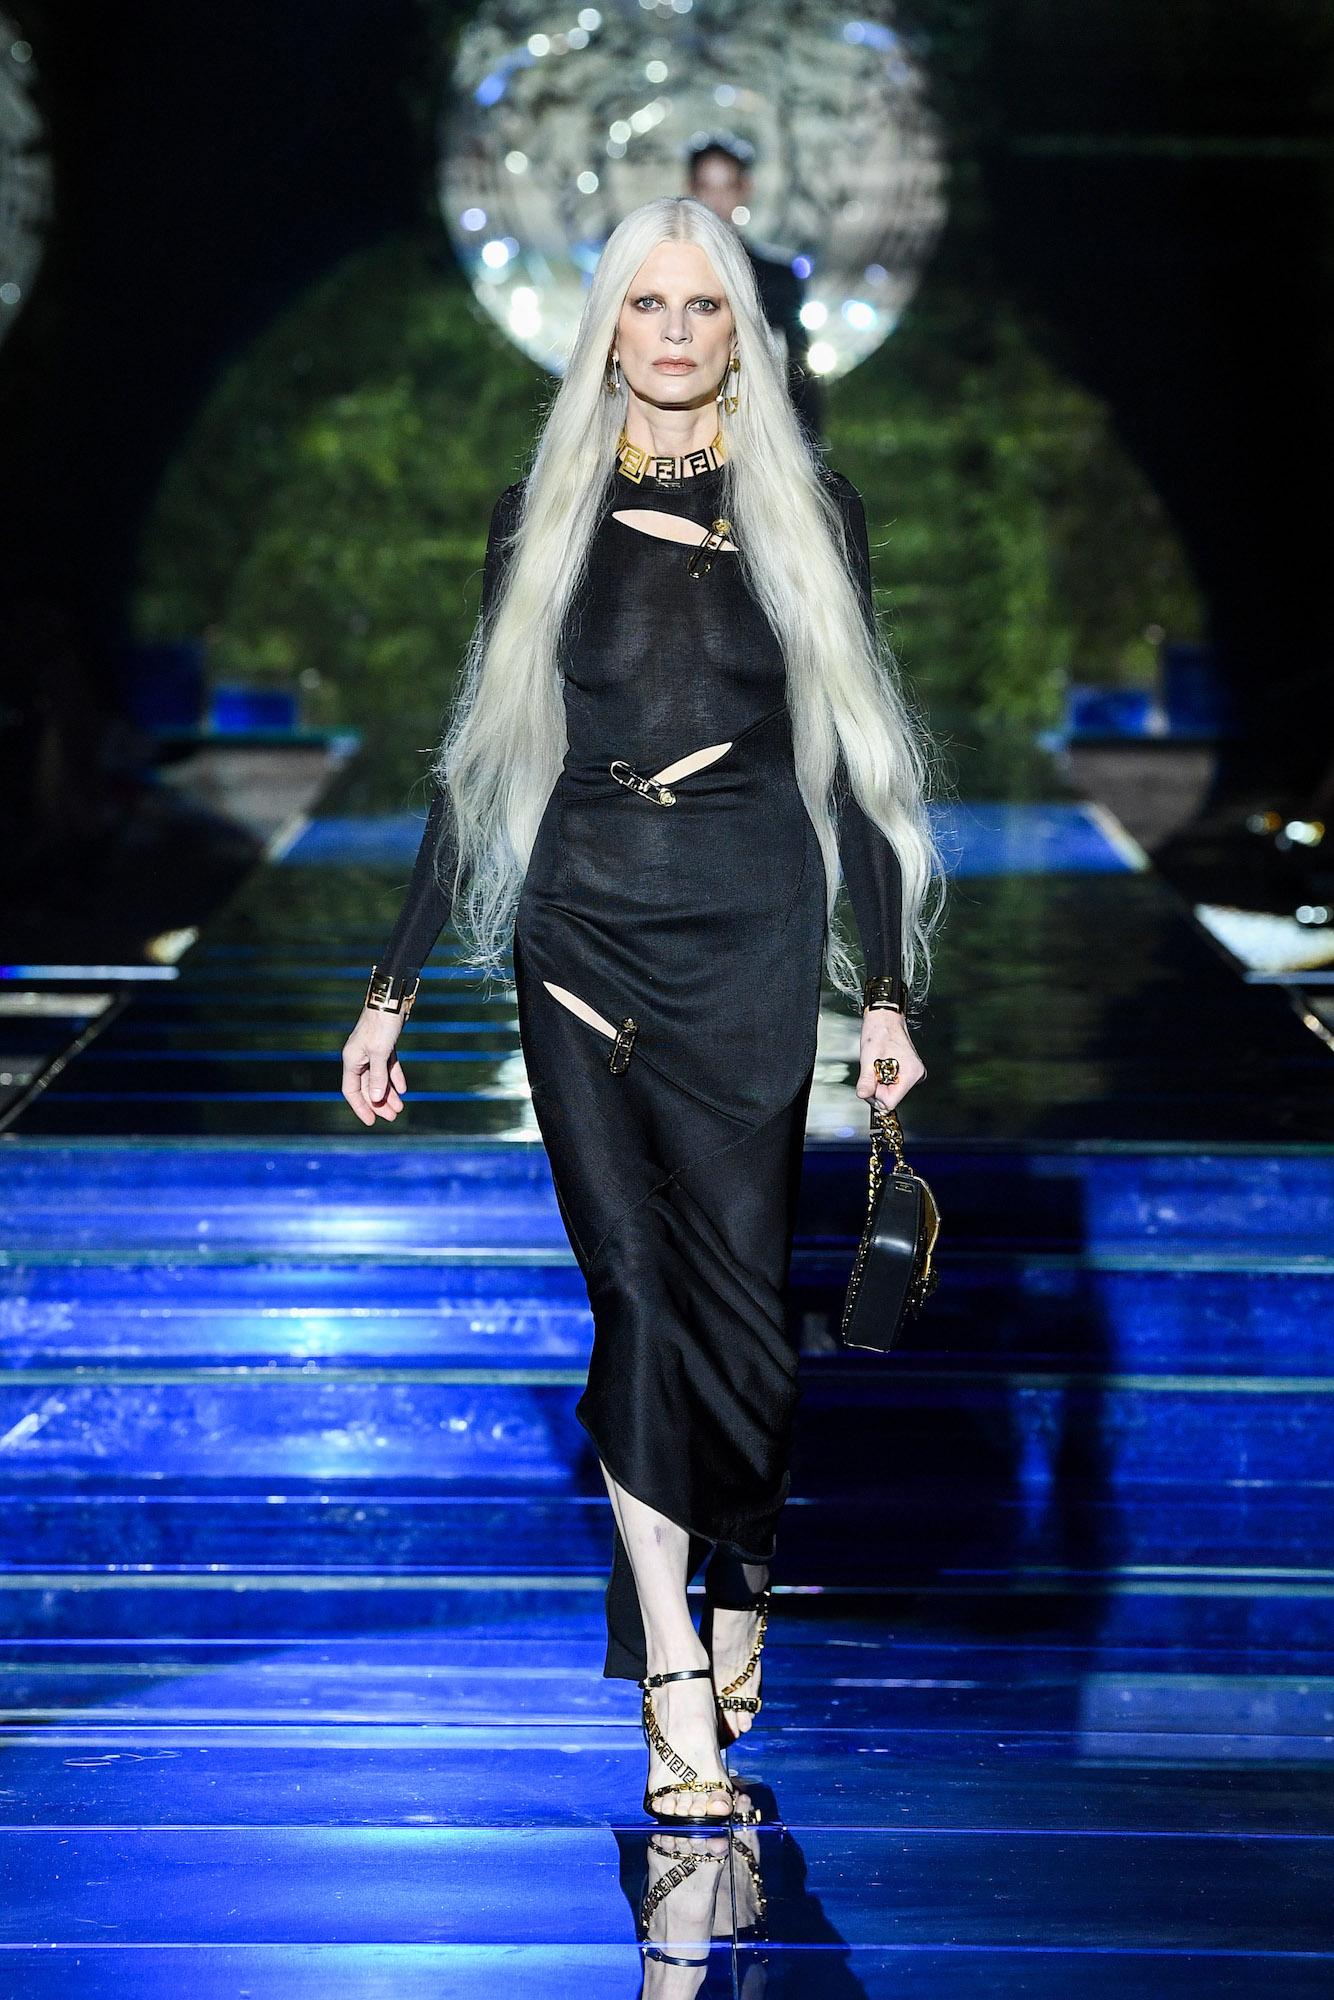 versace by fendi (1)